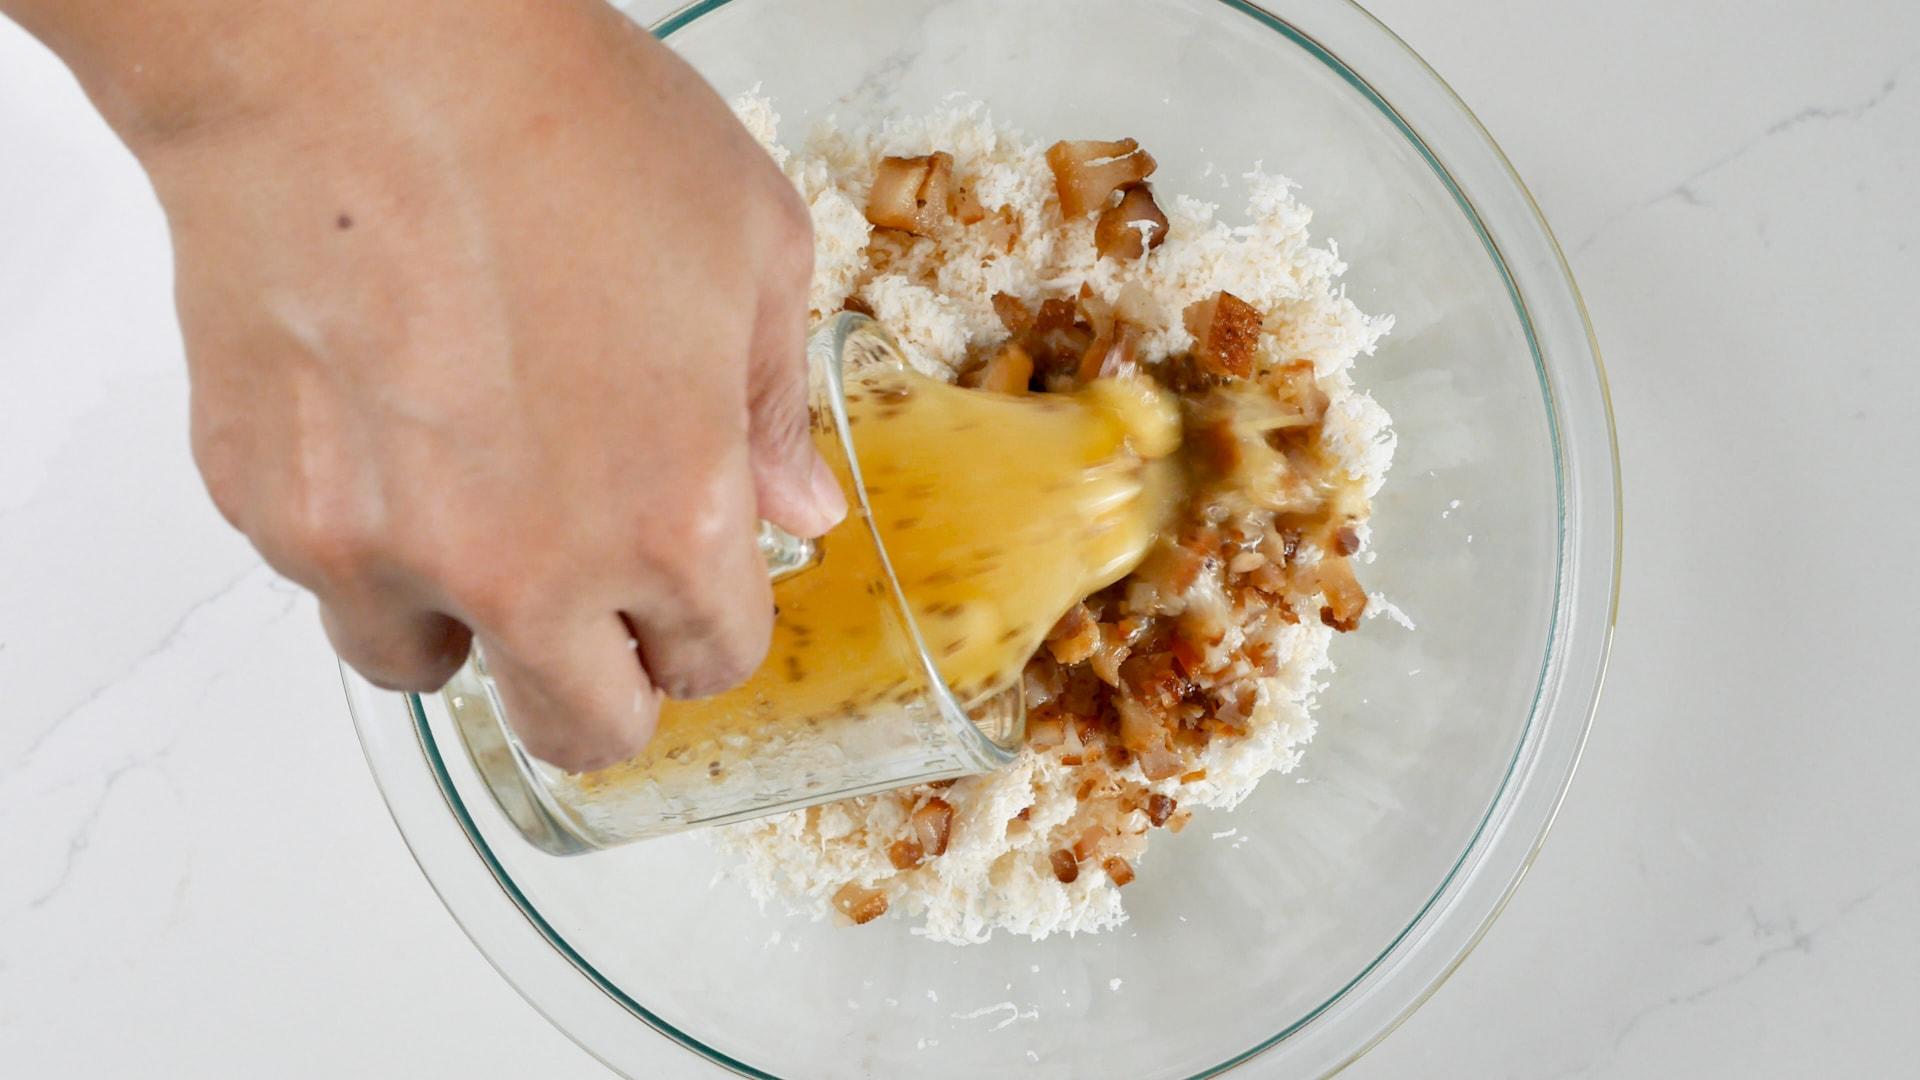 Adding broth to dough